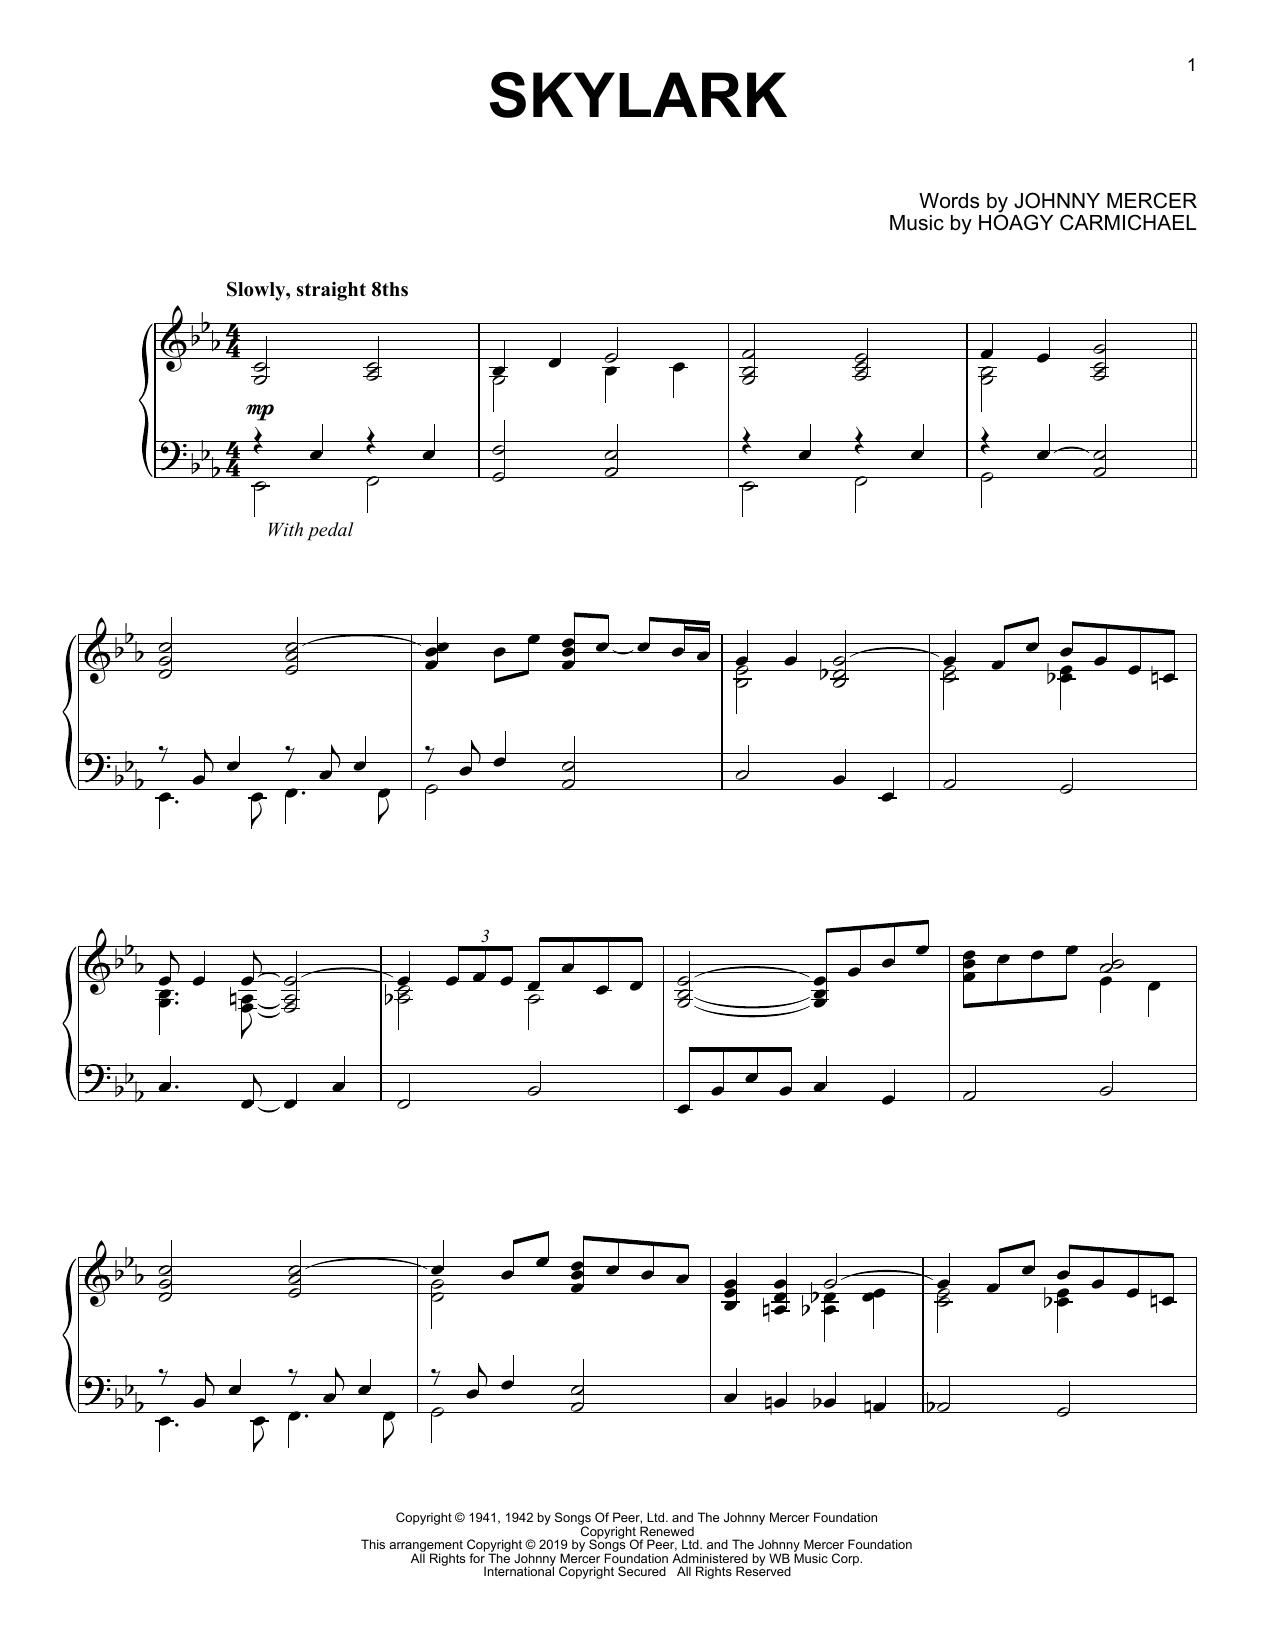 Hoagy Carmichael 'Skylark' Sheet Music Notes, Chords | Download Printable  Piano Solo - SKU: 411075